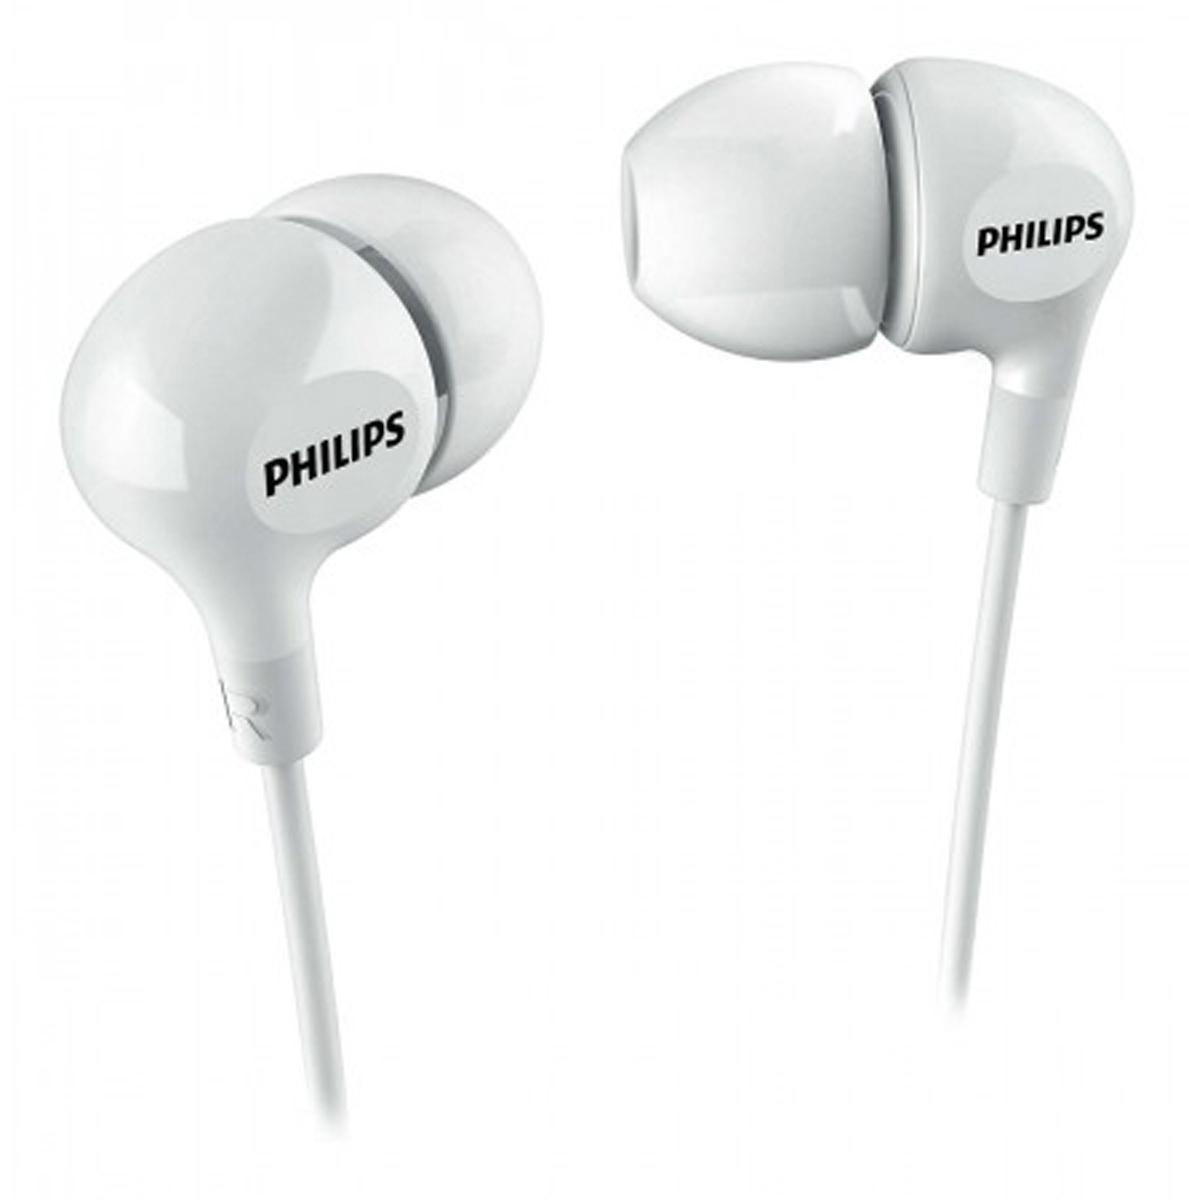 Philips SHE3550, White наушники - Наушники